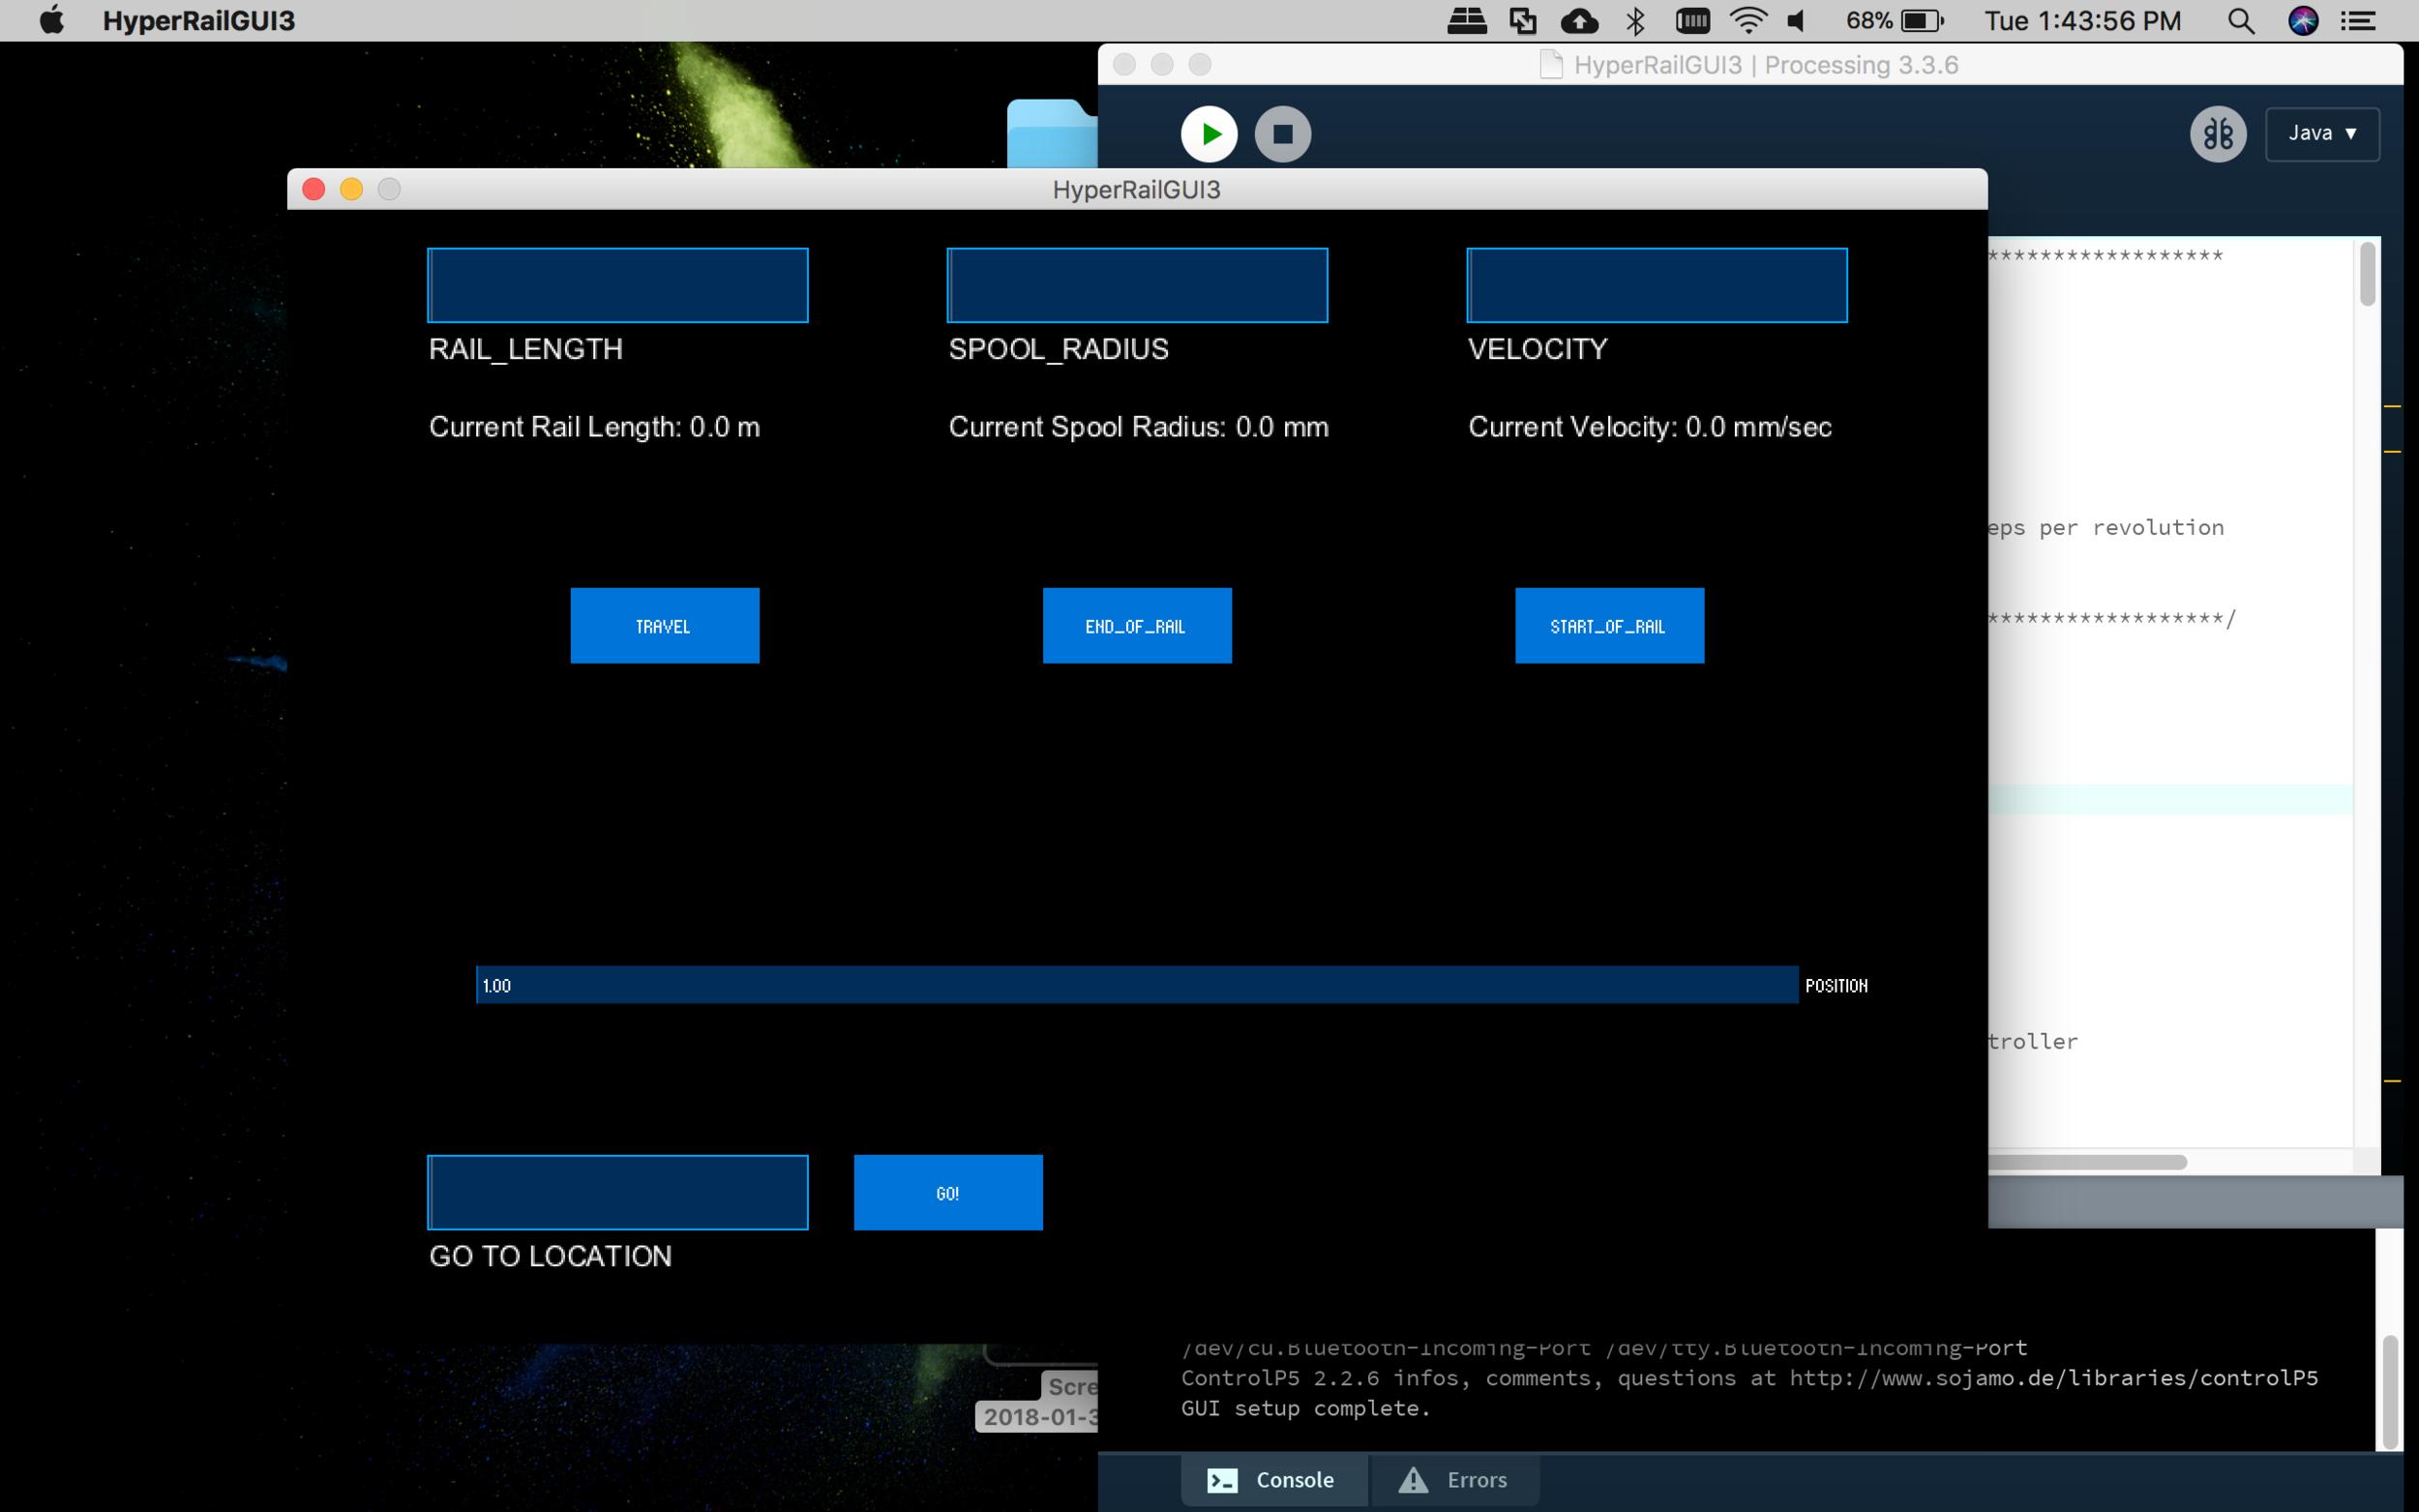 Screenshot of the HyperRail GUI